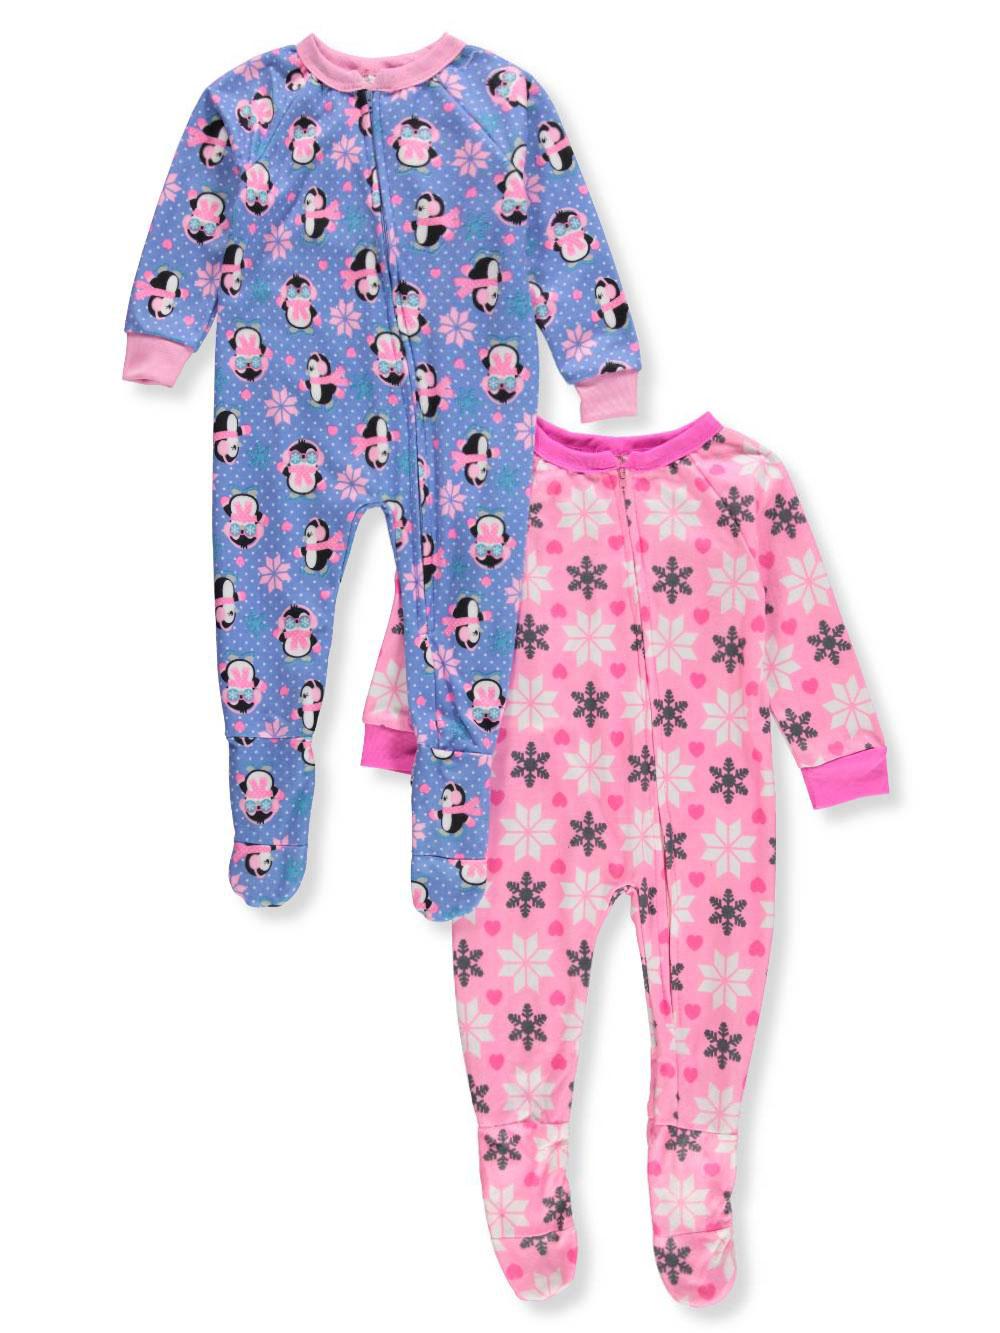 7d10361b0b5f Size 18 Months Baby Pajamas - Kmart